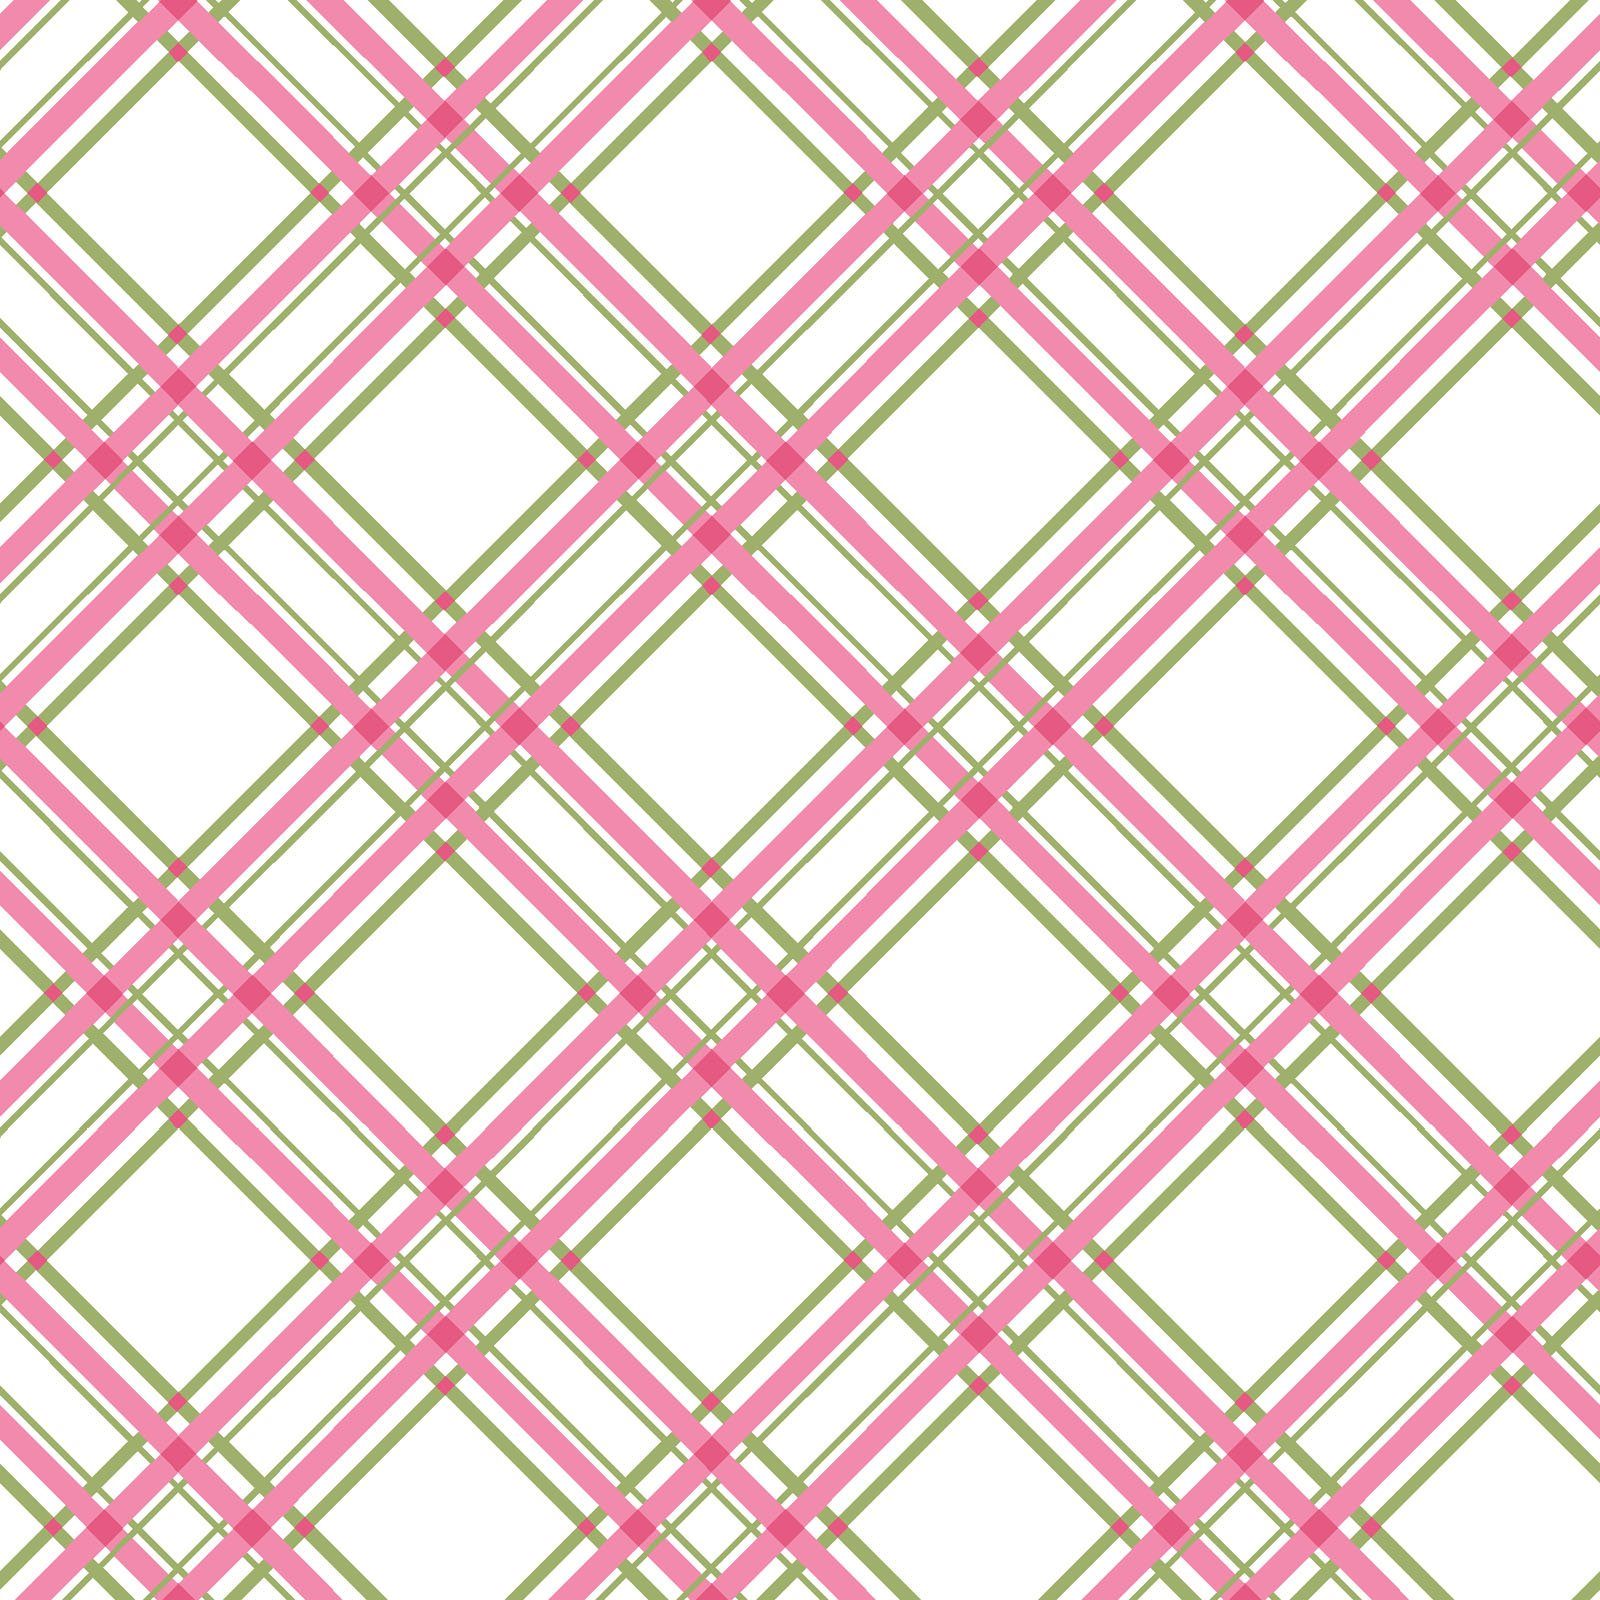 KimberBell Basics Pink/Grey Diagonal Plaid 8244M-PG